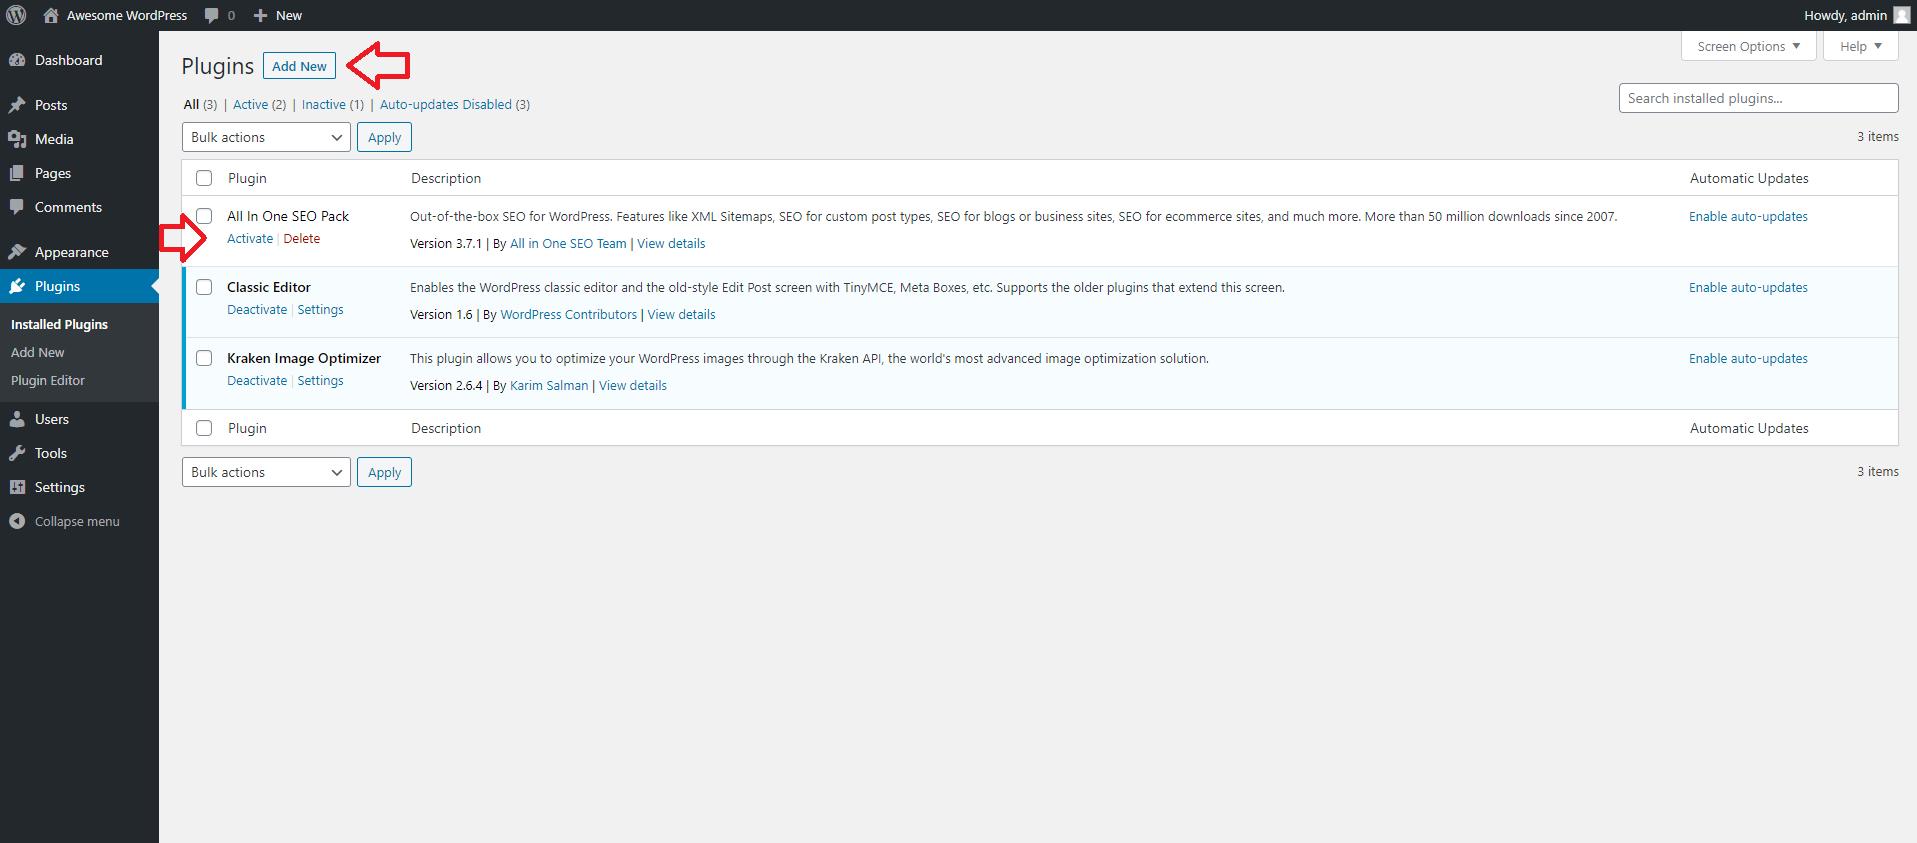 How to Use the WordPress Dashboard - Add Plugins to WordPress